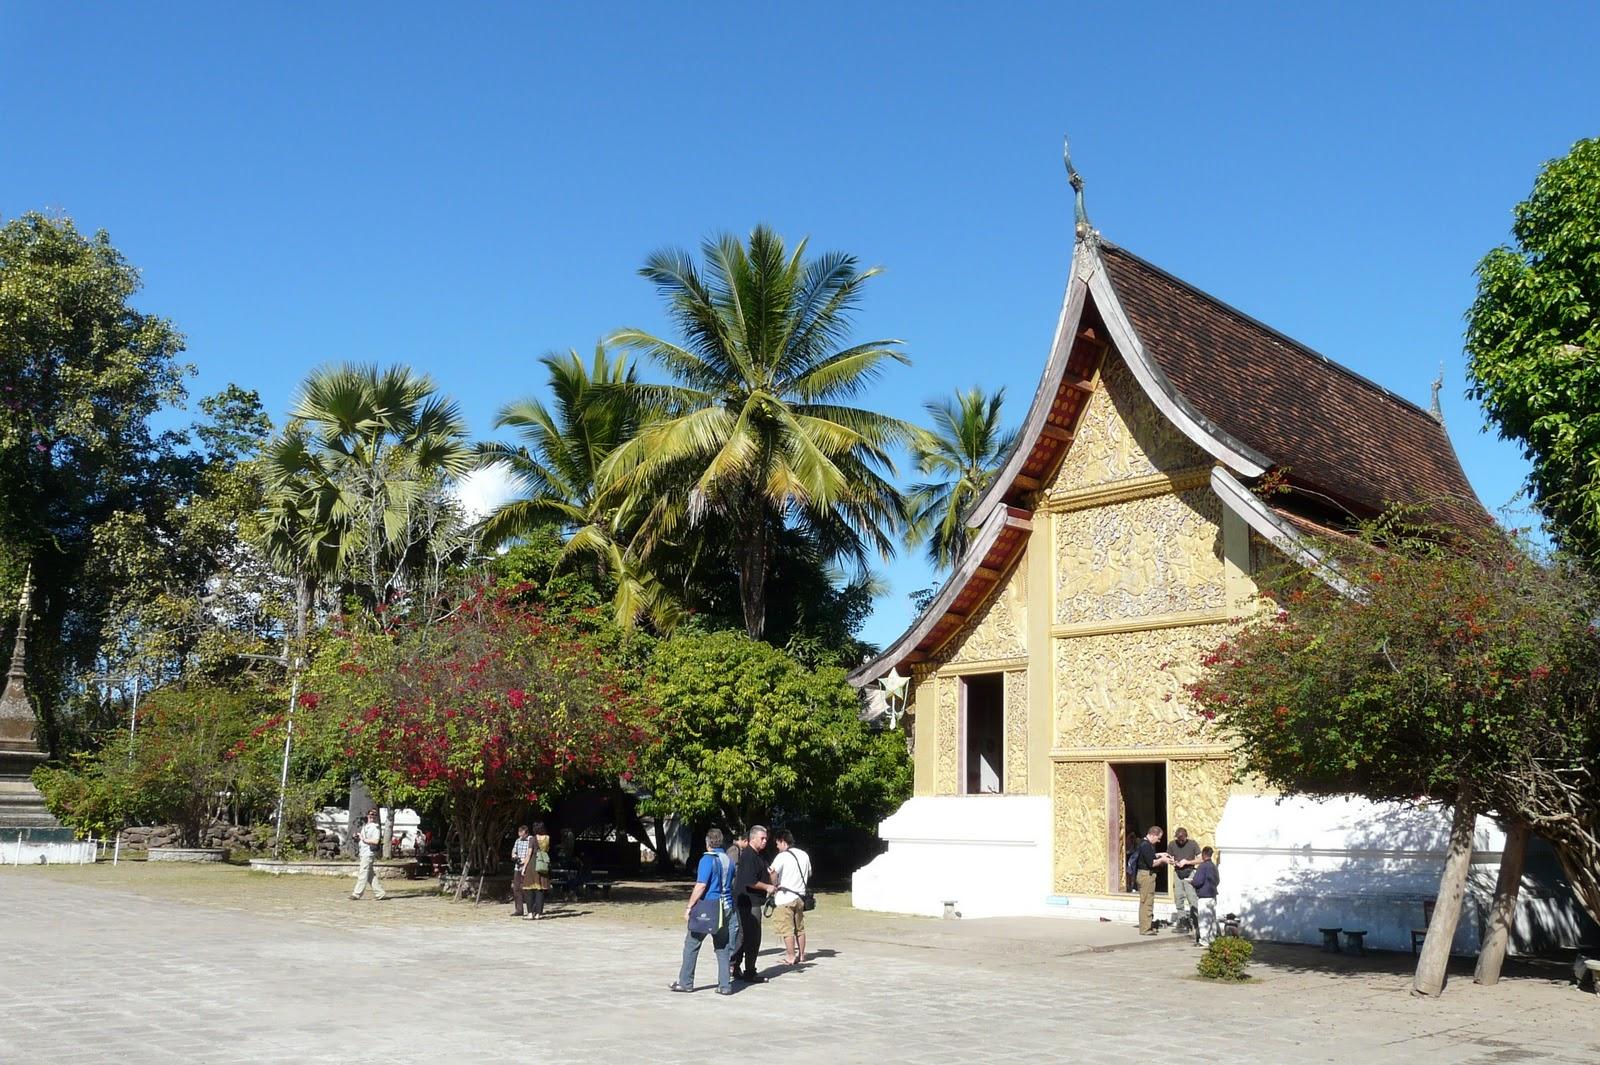 Phoebettmh Travel Laos Luang Prabang A Place Must